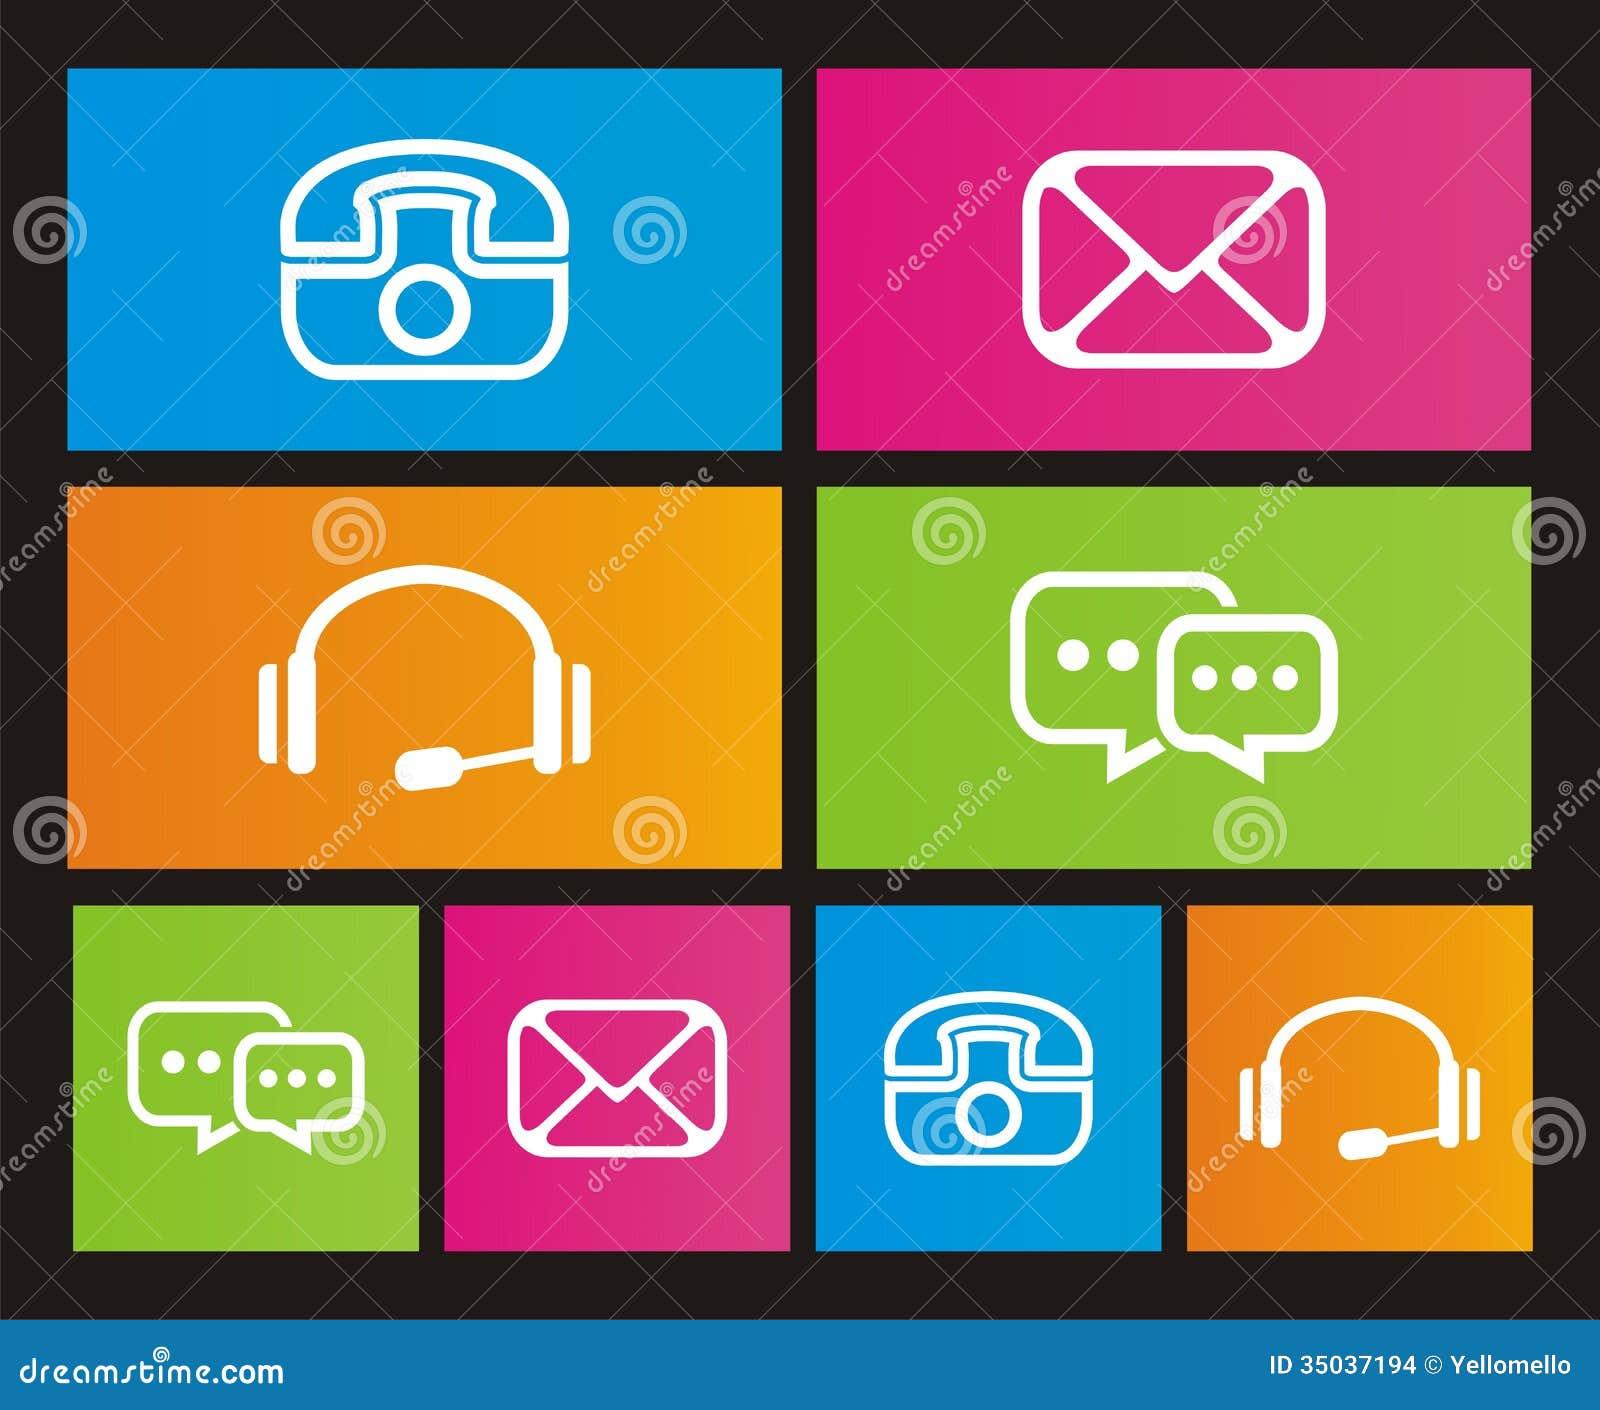 Contact icon - metro style